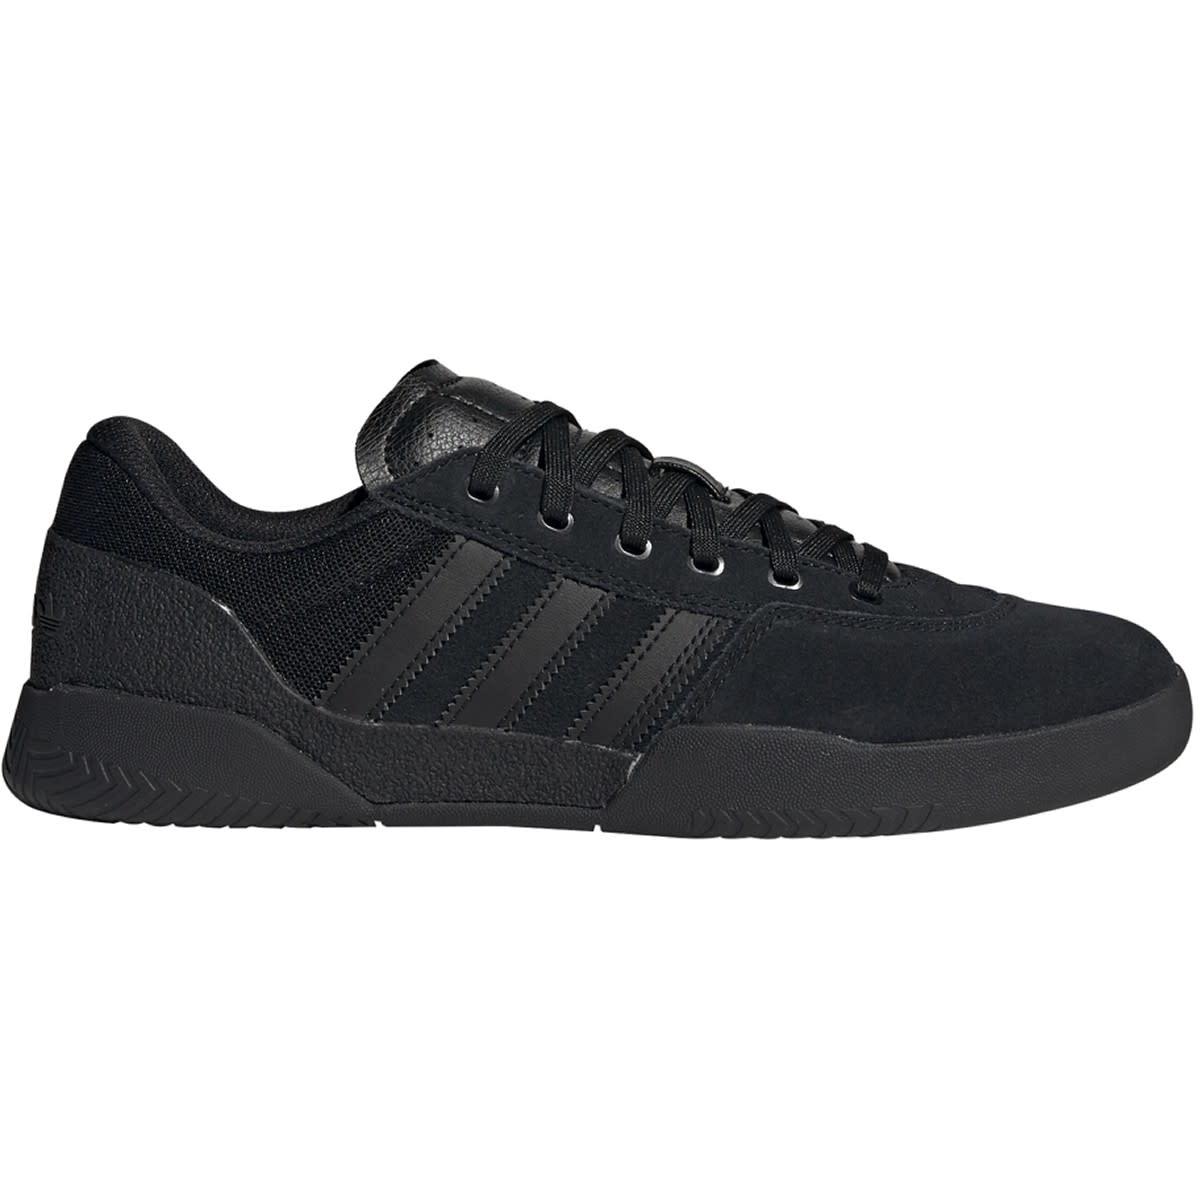 Adidas Adidas City Cup - Black/Black/Black